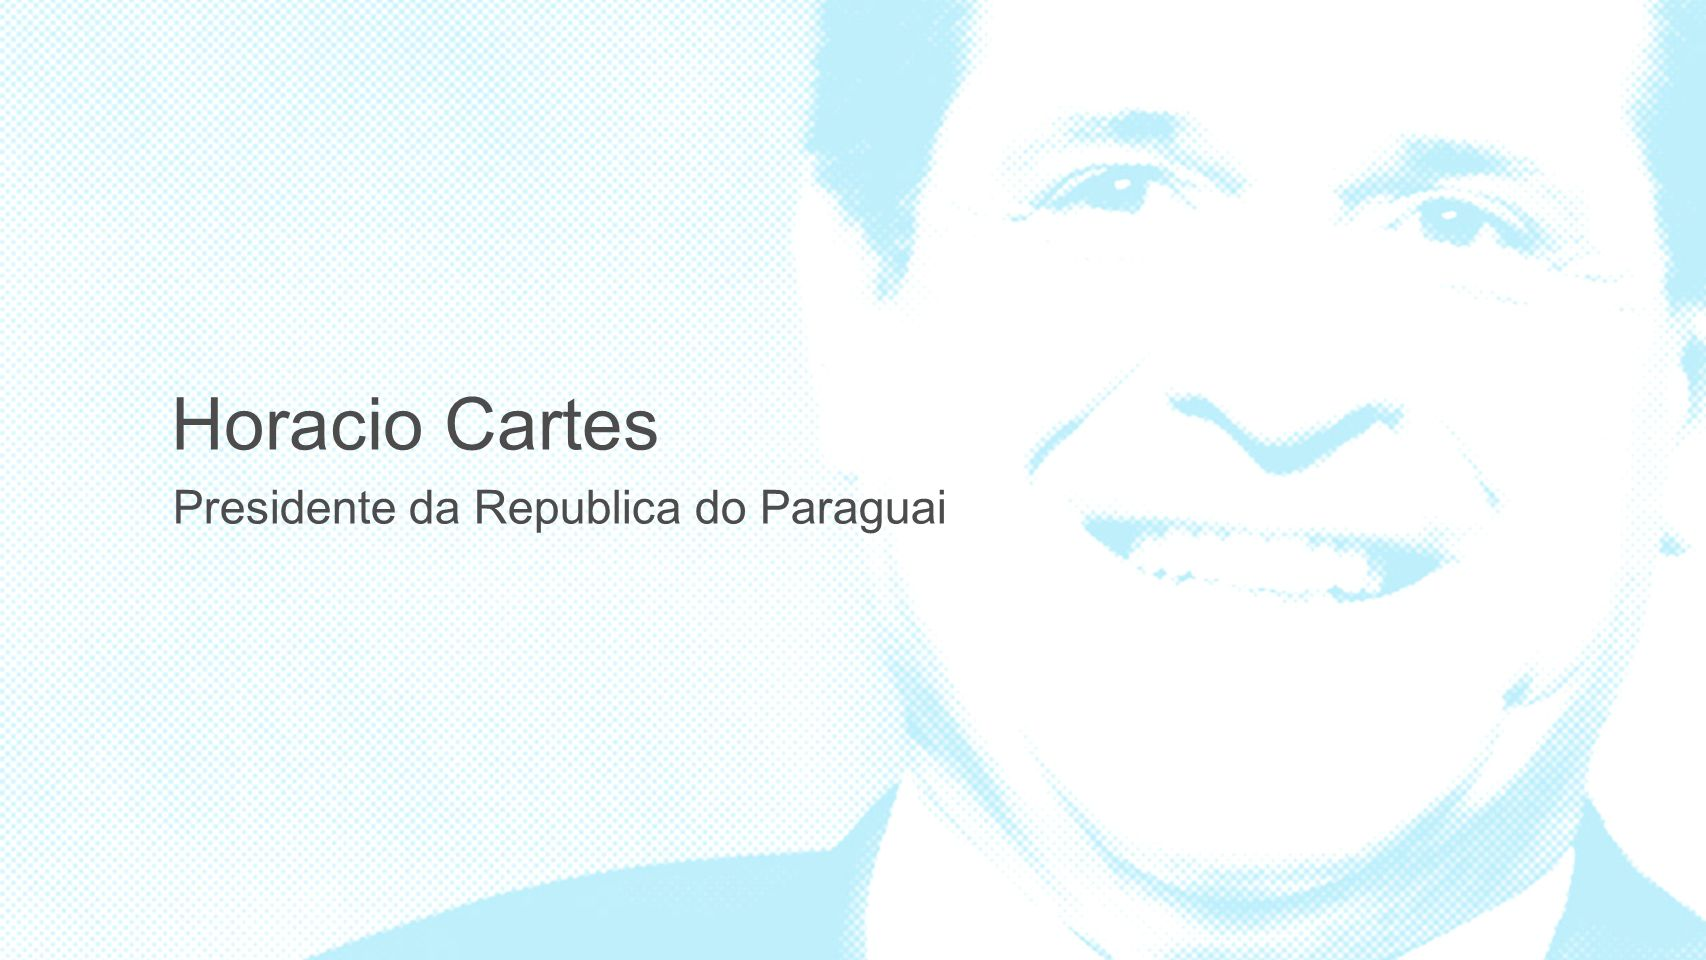 Presidente da Republica do Paraguai Horacio Cartes